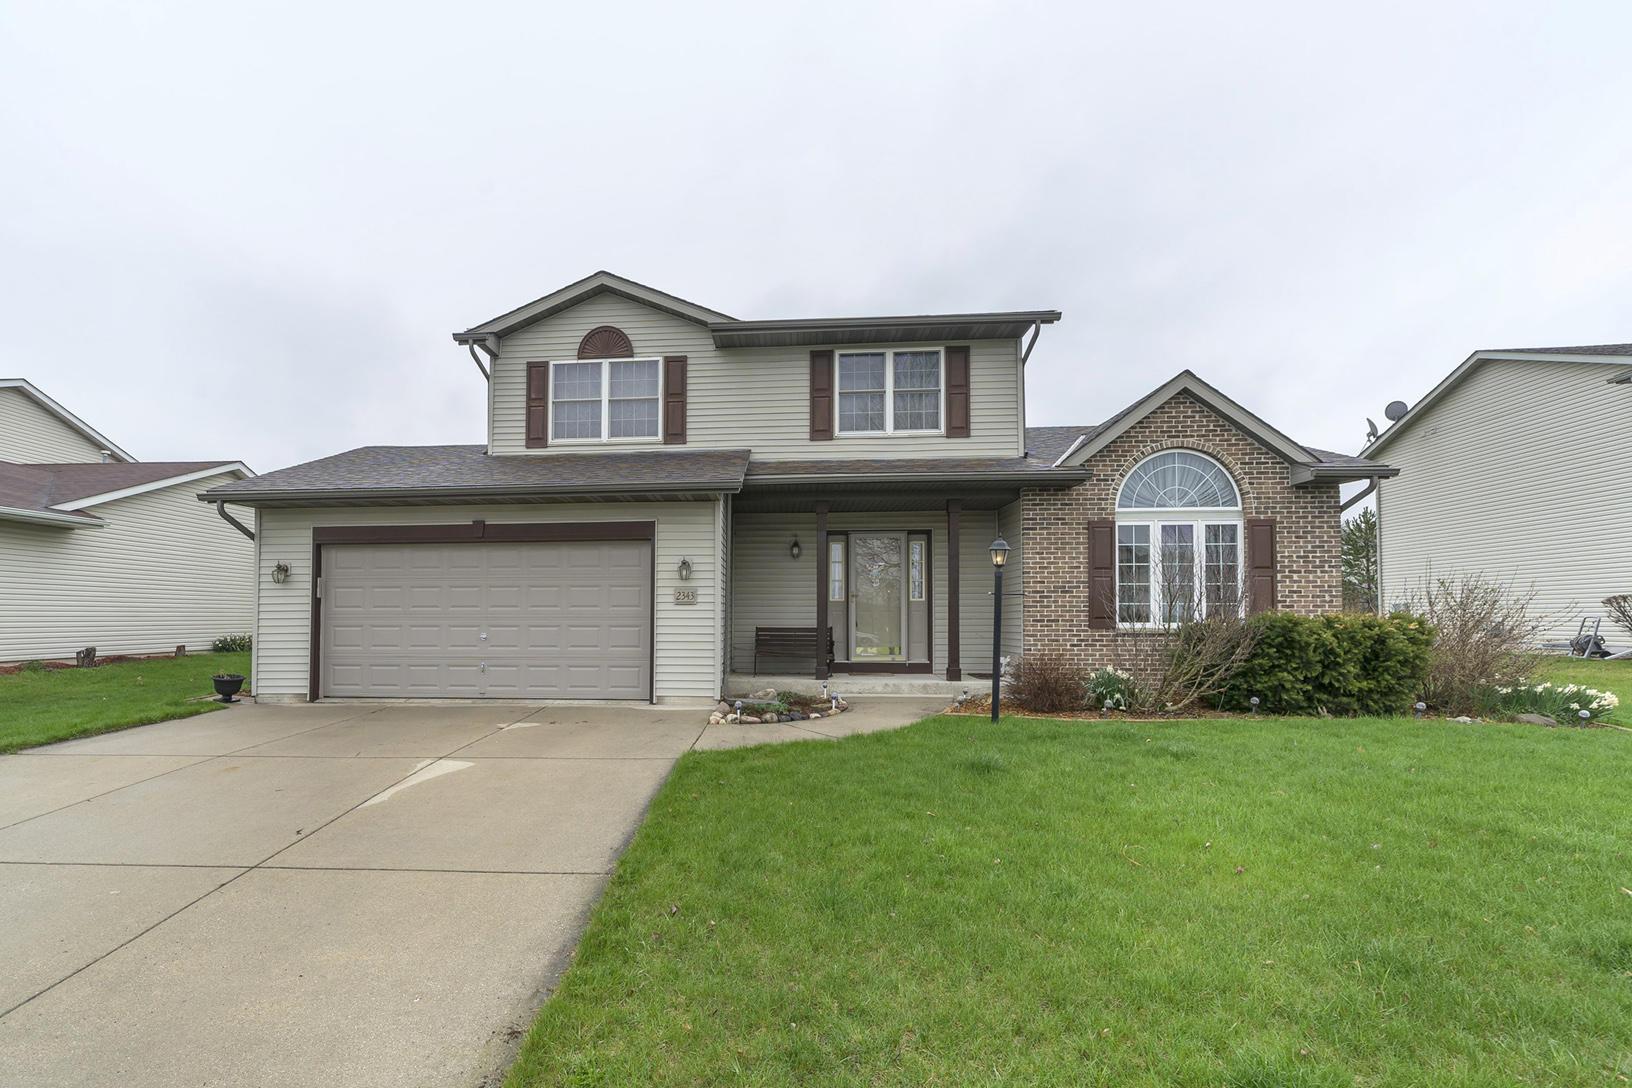 2343 Tamarack Ln, Waukesha, Wisconsin 53188, 3 Bedrooms Bedrooms, ,2 BathroomsBathrooms,Single-Family,For Sale,Tamarack Ln,1634869